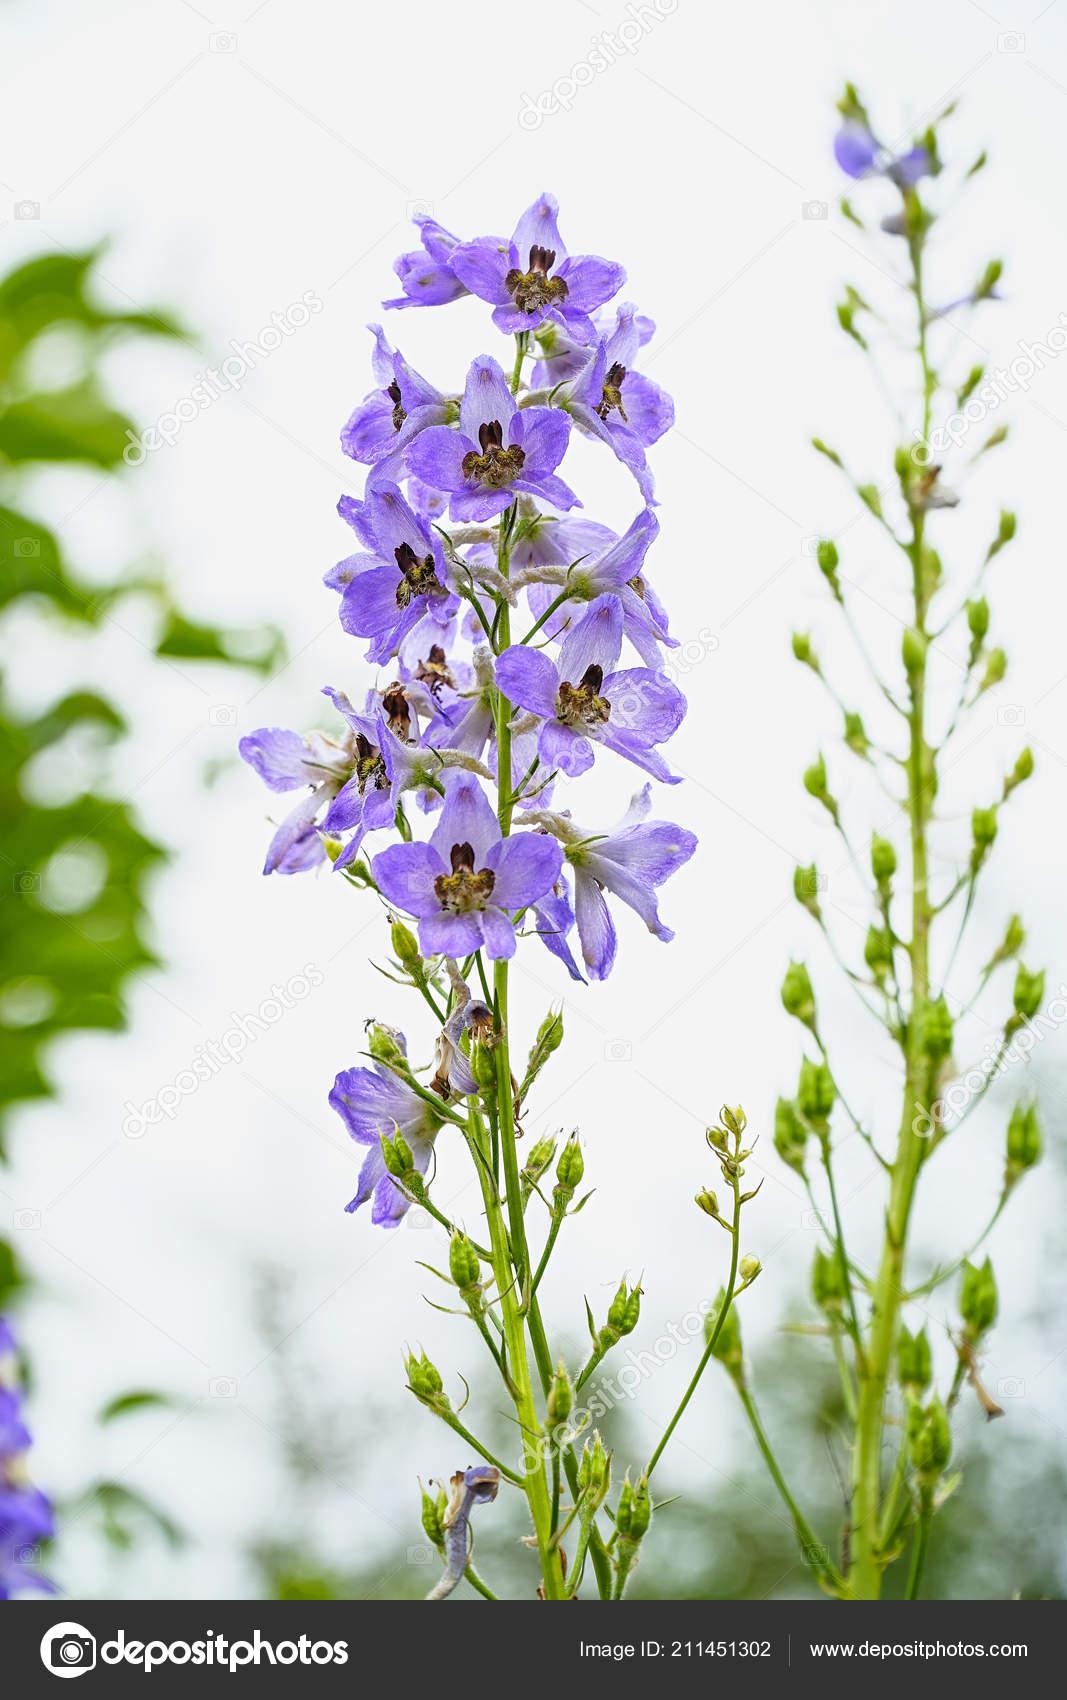 Blue Flower Delphinium White Background Stock Photo Pro2audio